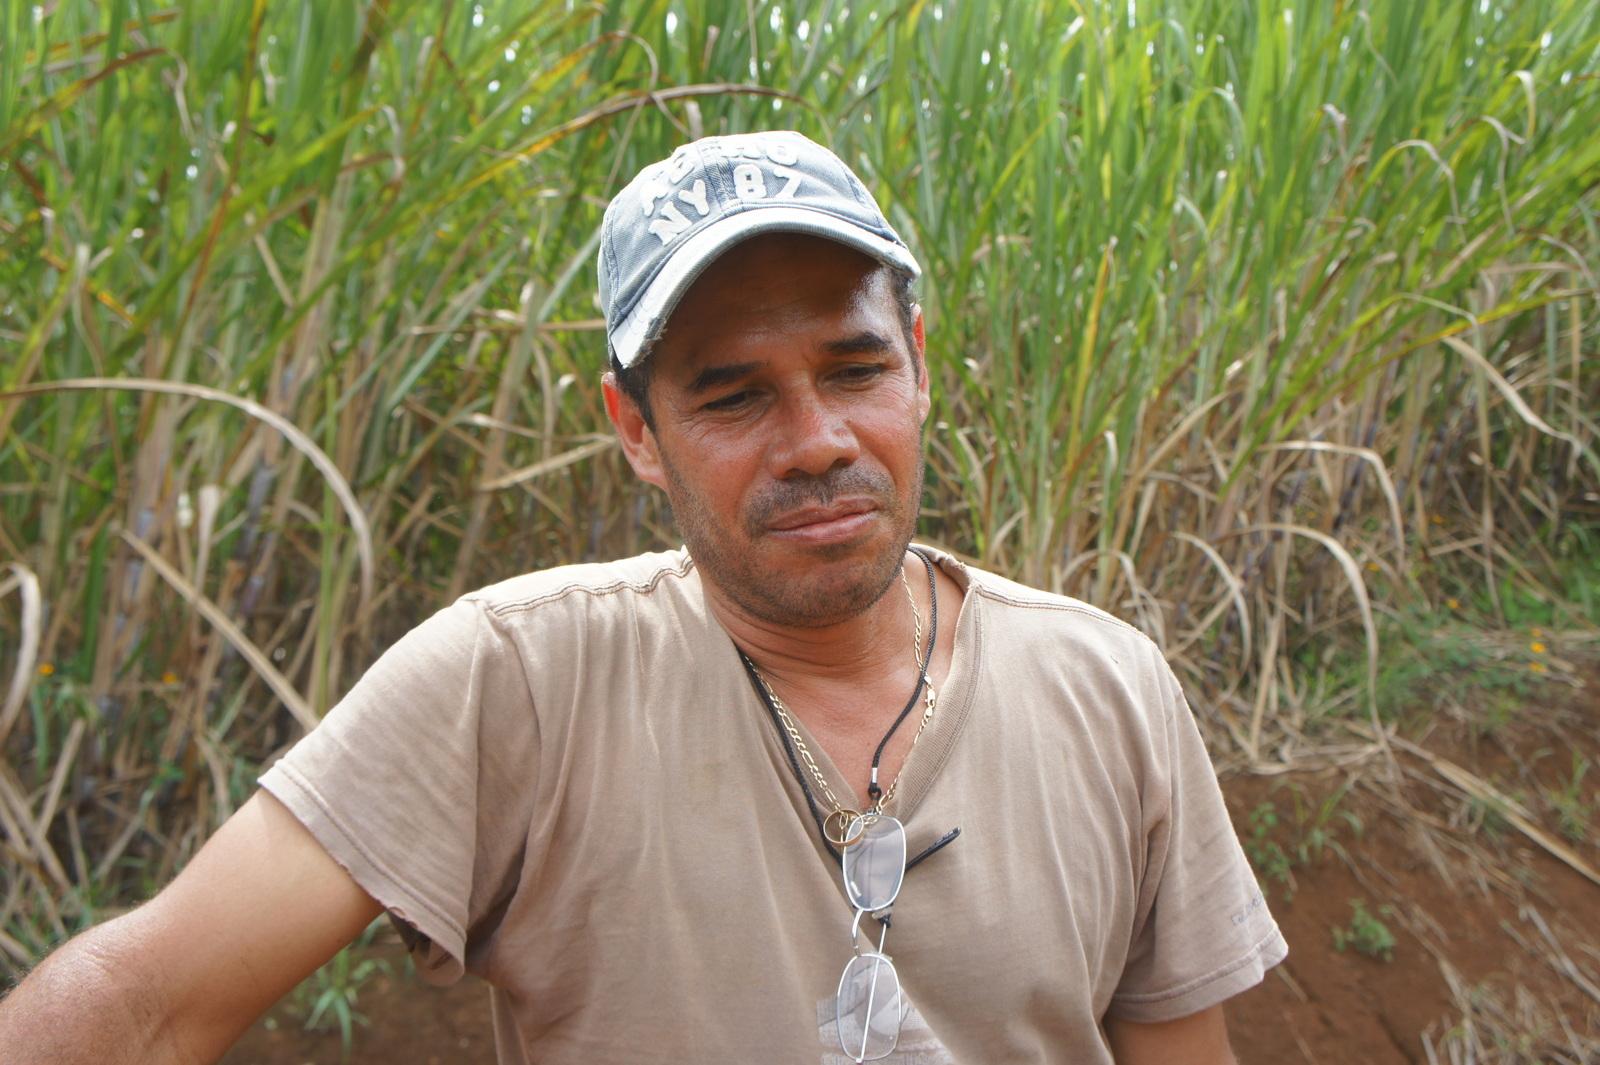 Henry Moraga Bejarano